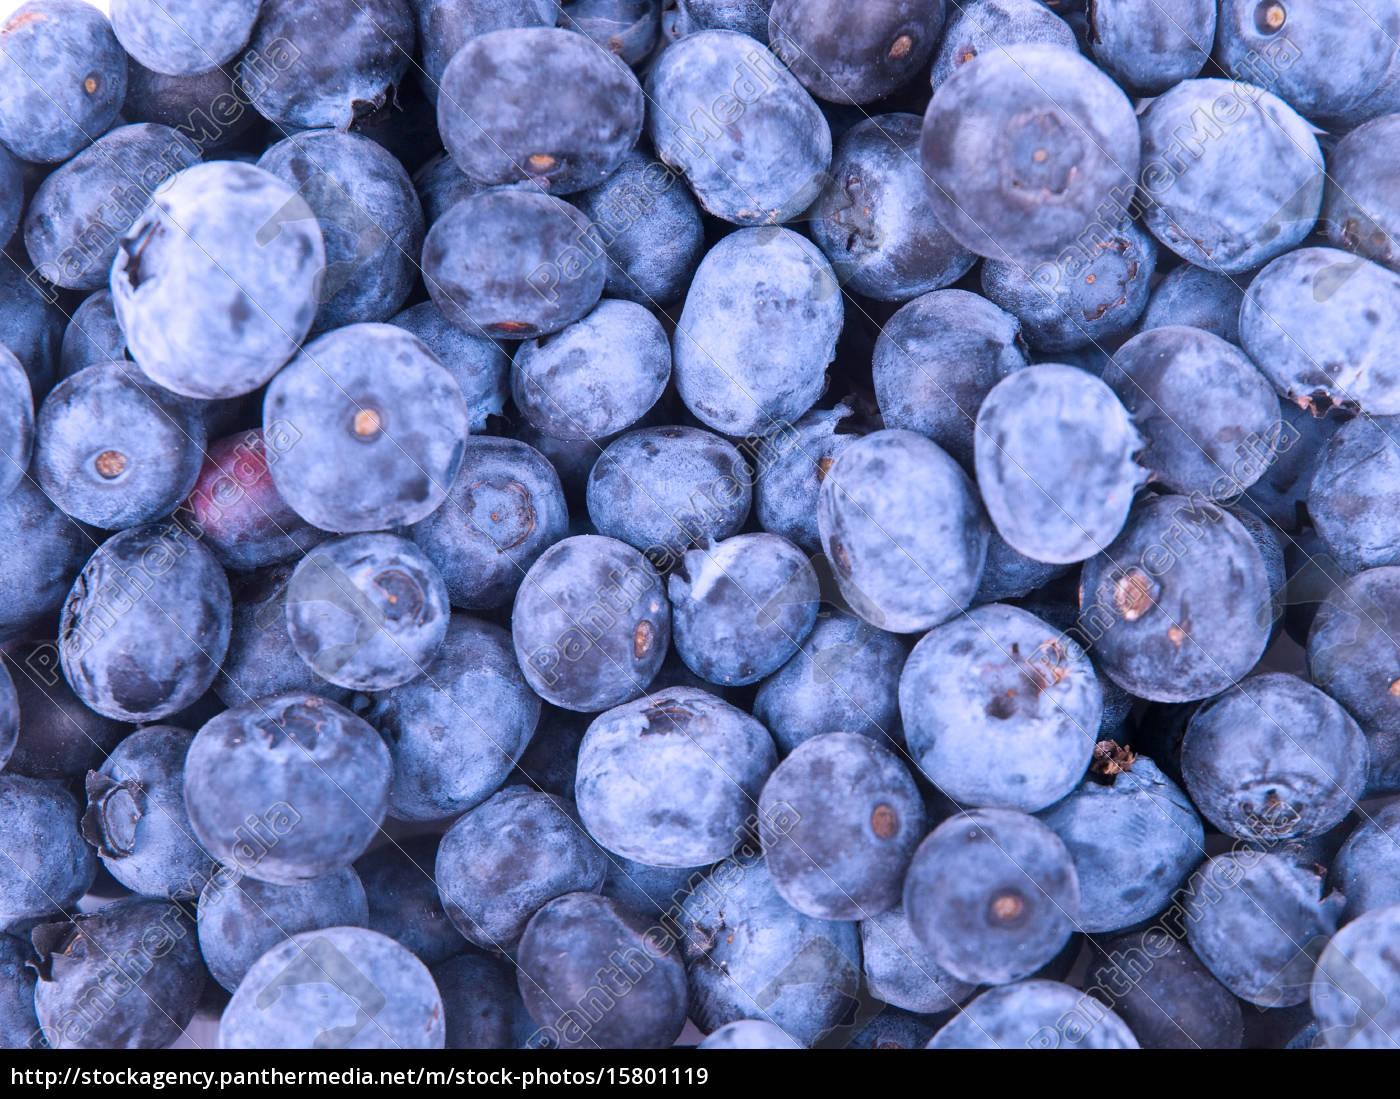 blueberries, blueberries, blueberries, blueberries - 15801119